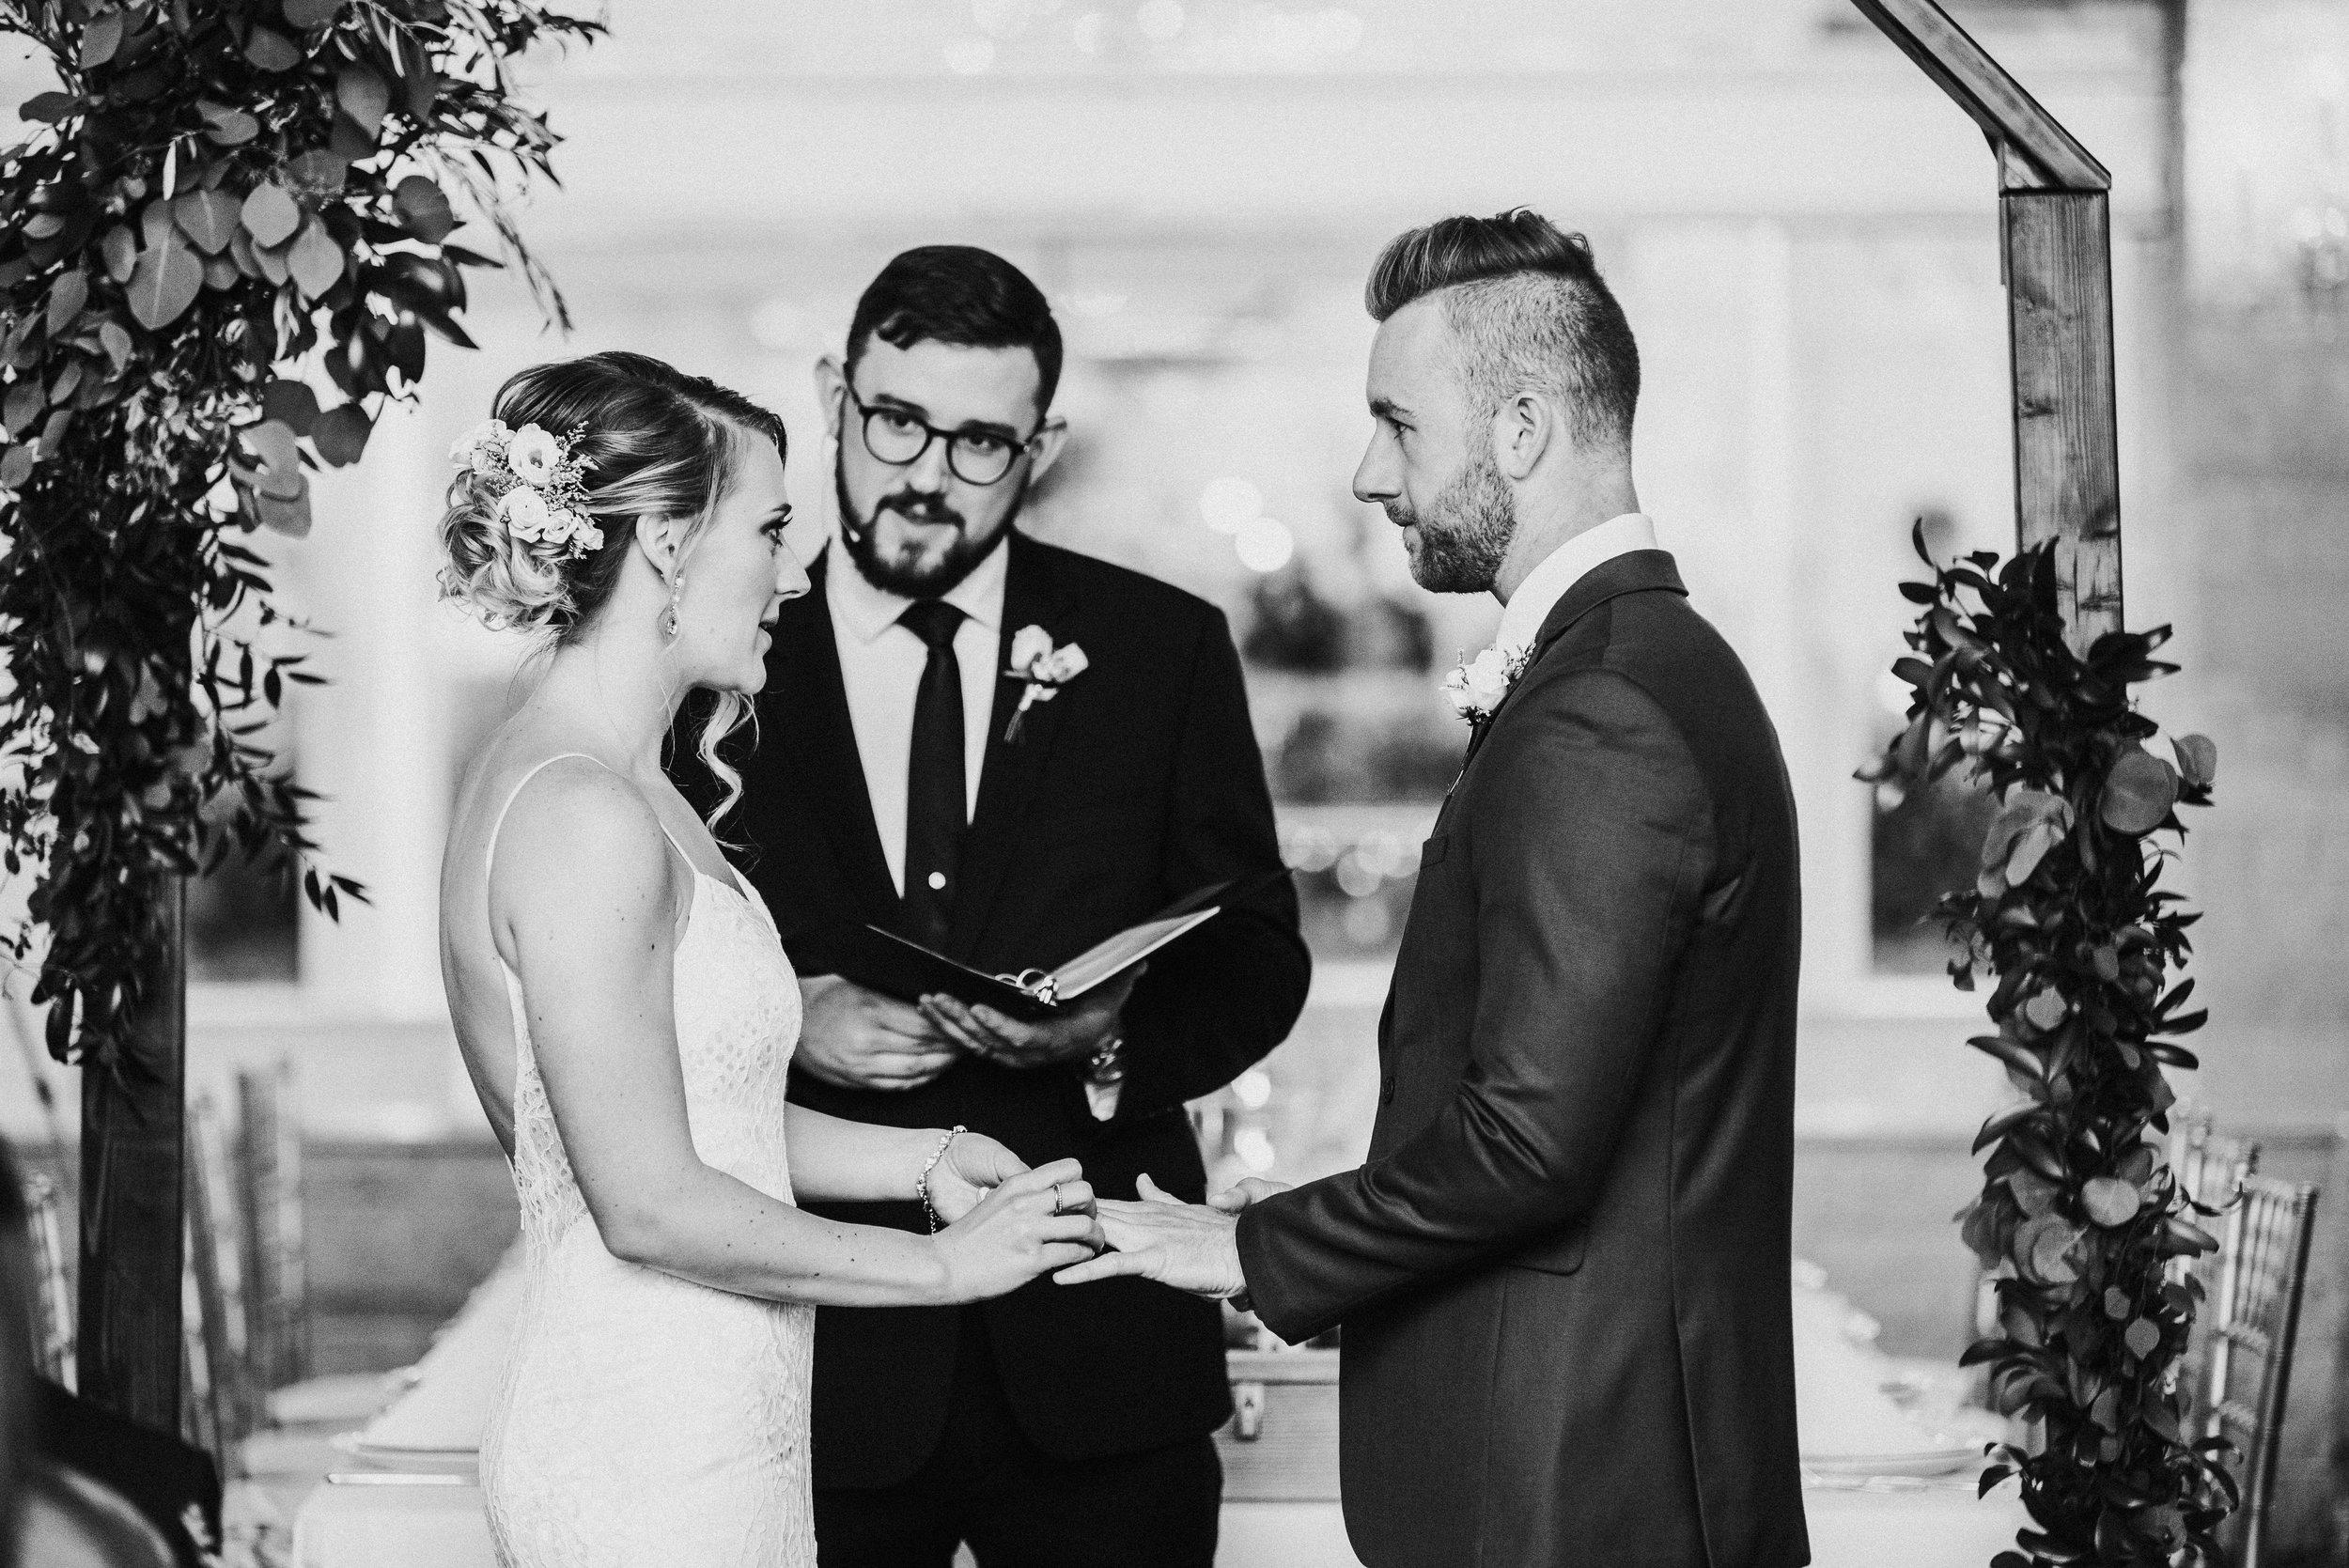 Stephanie and Chris | Elegant Modern Summer Wedding | Moser Tower & Meson Sabika, Naperville, IL | Chicago Wedding Photographer